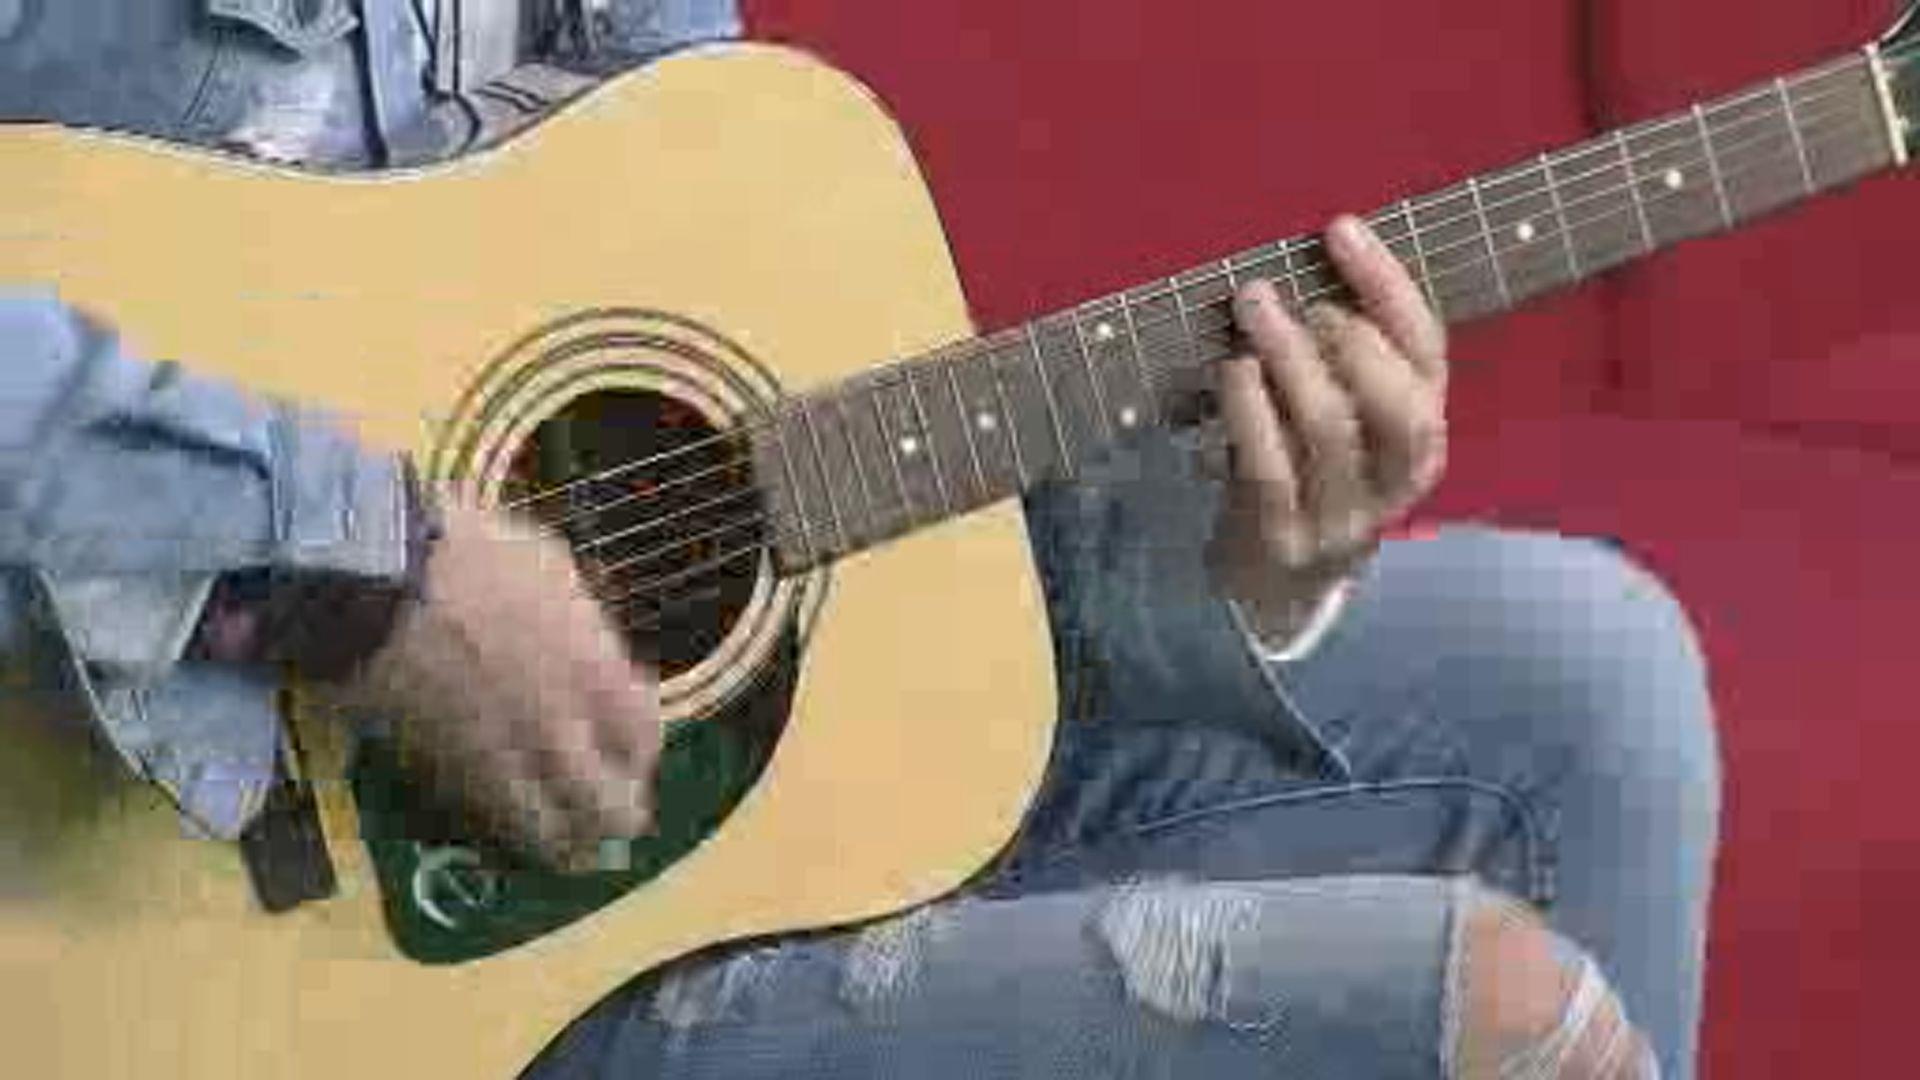 Manitoba talent 'bands together' in support of Jocelyn House Hospice